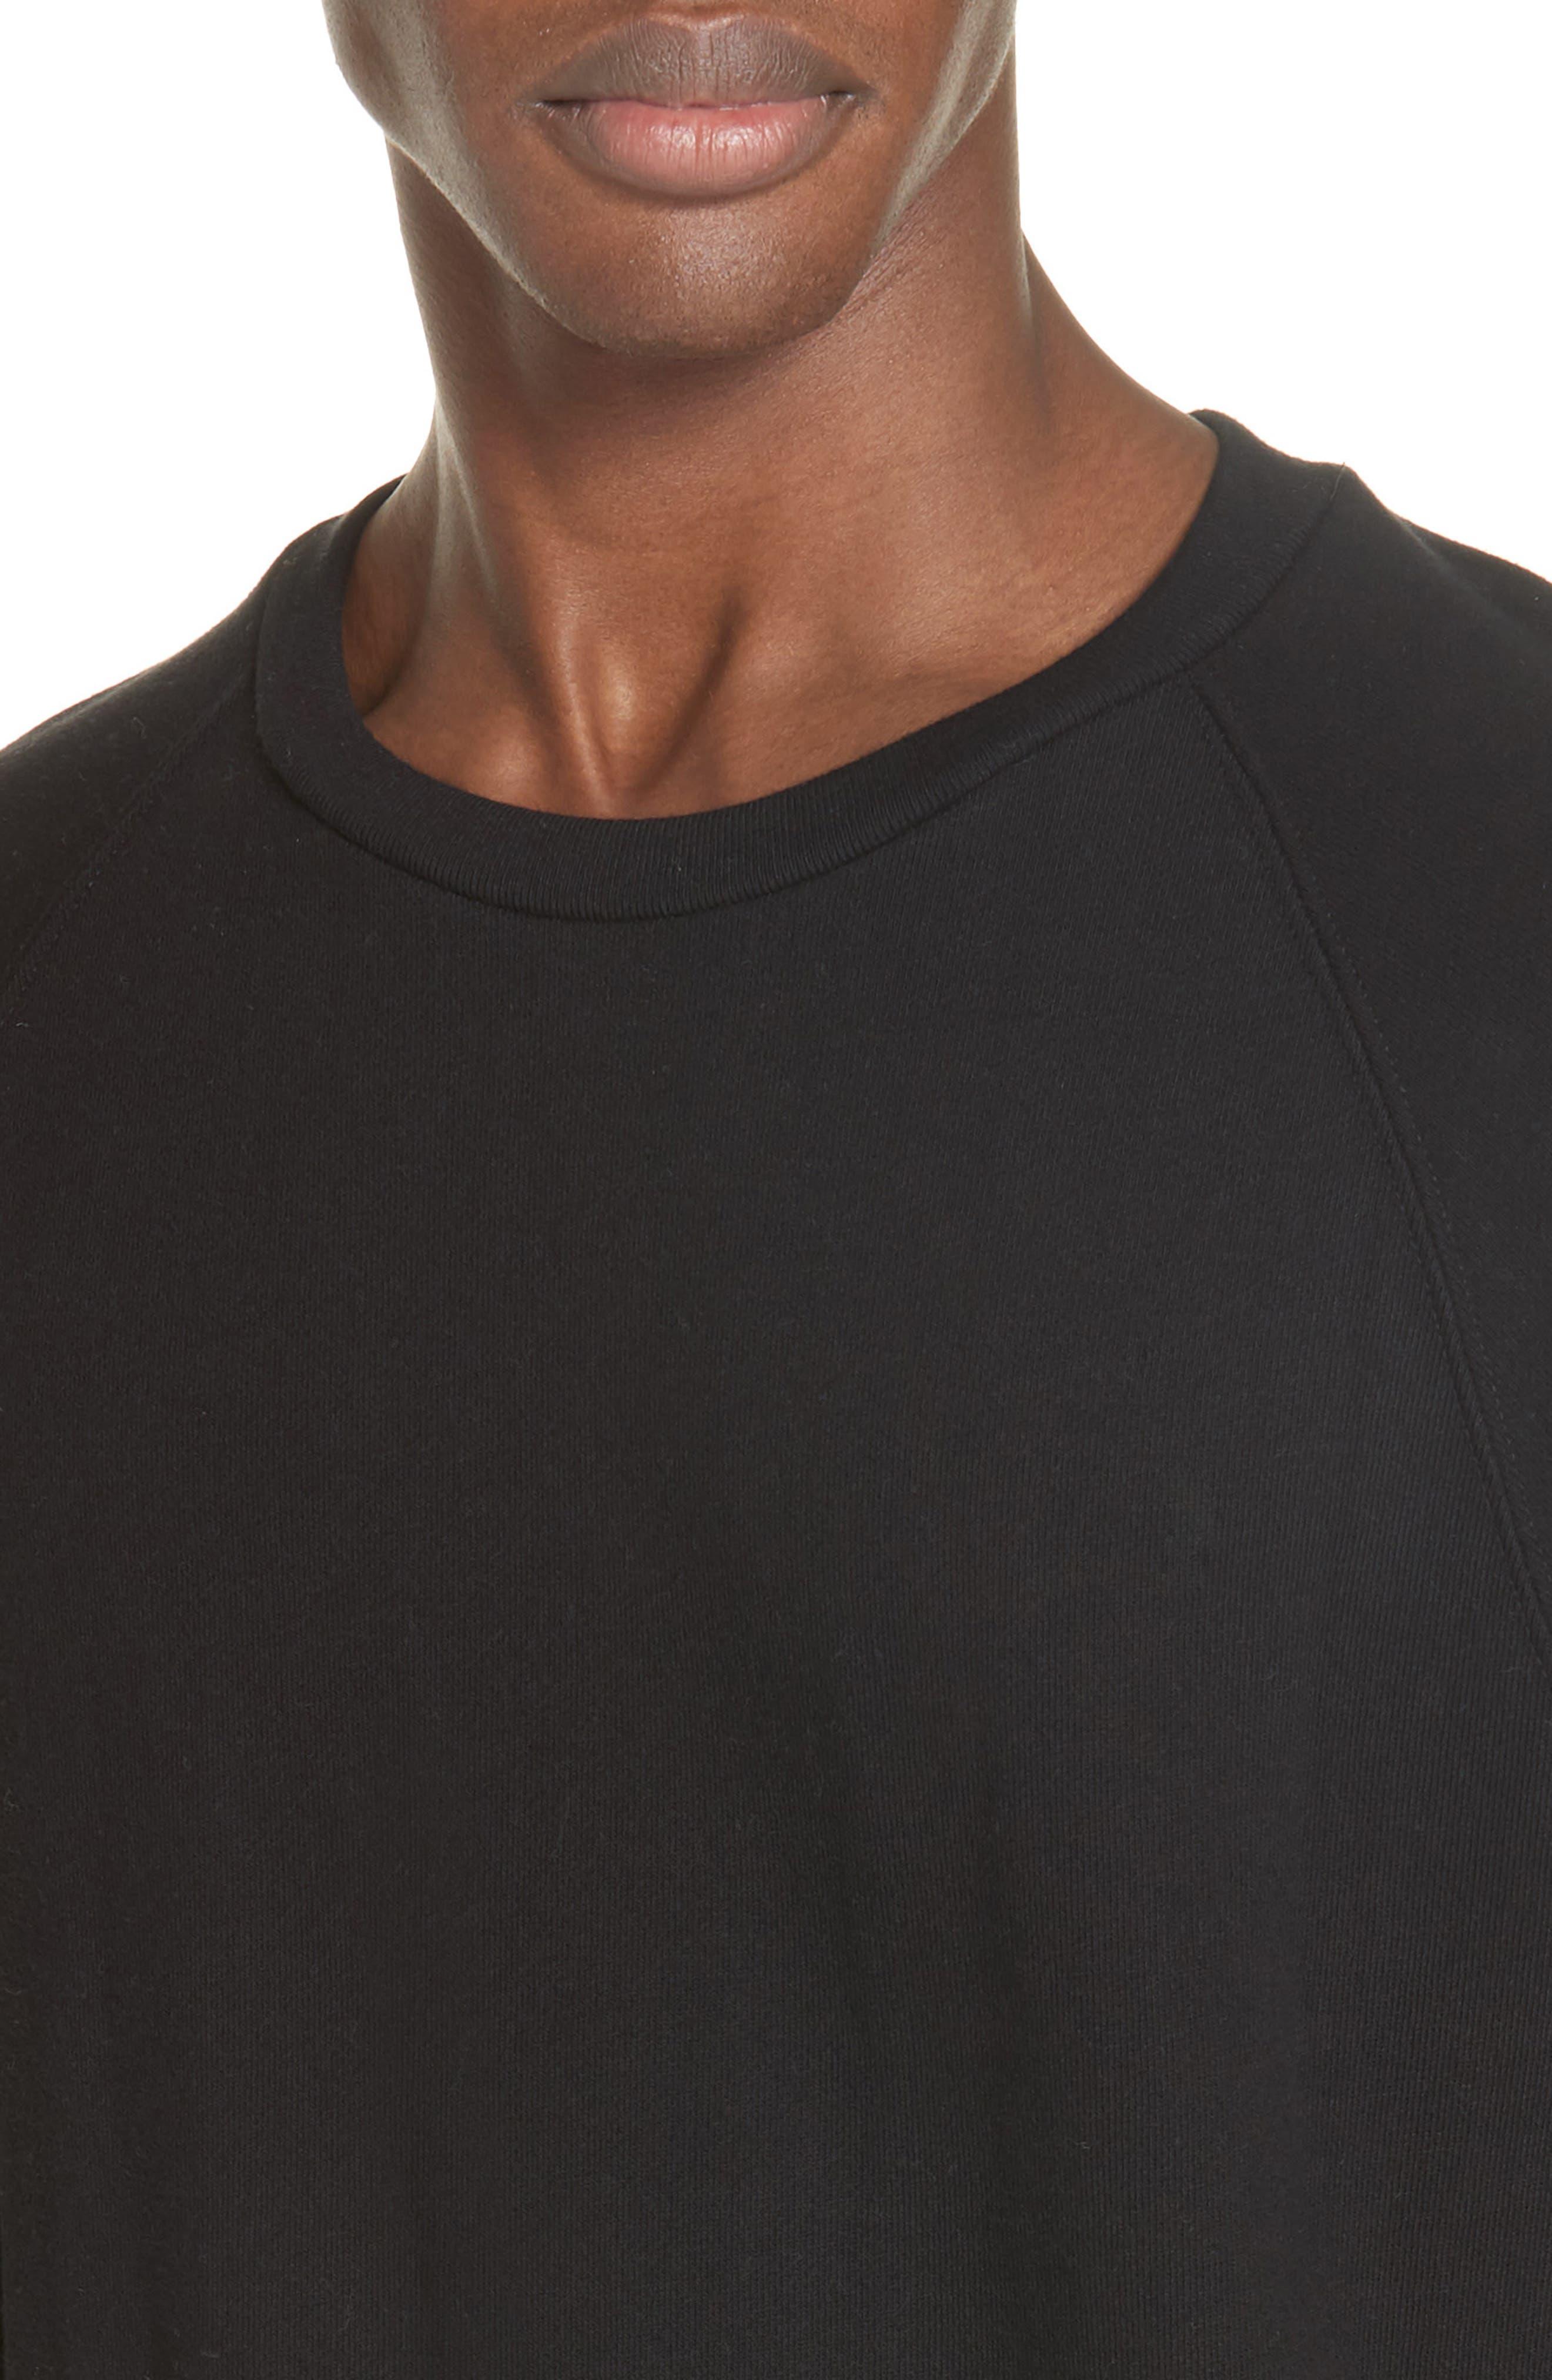 Raglan Crewneck Sweatshirt,                             Alternate thumbnail 4, color,                             BLACK